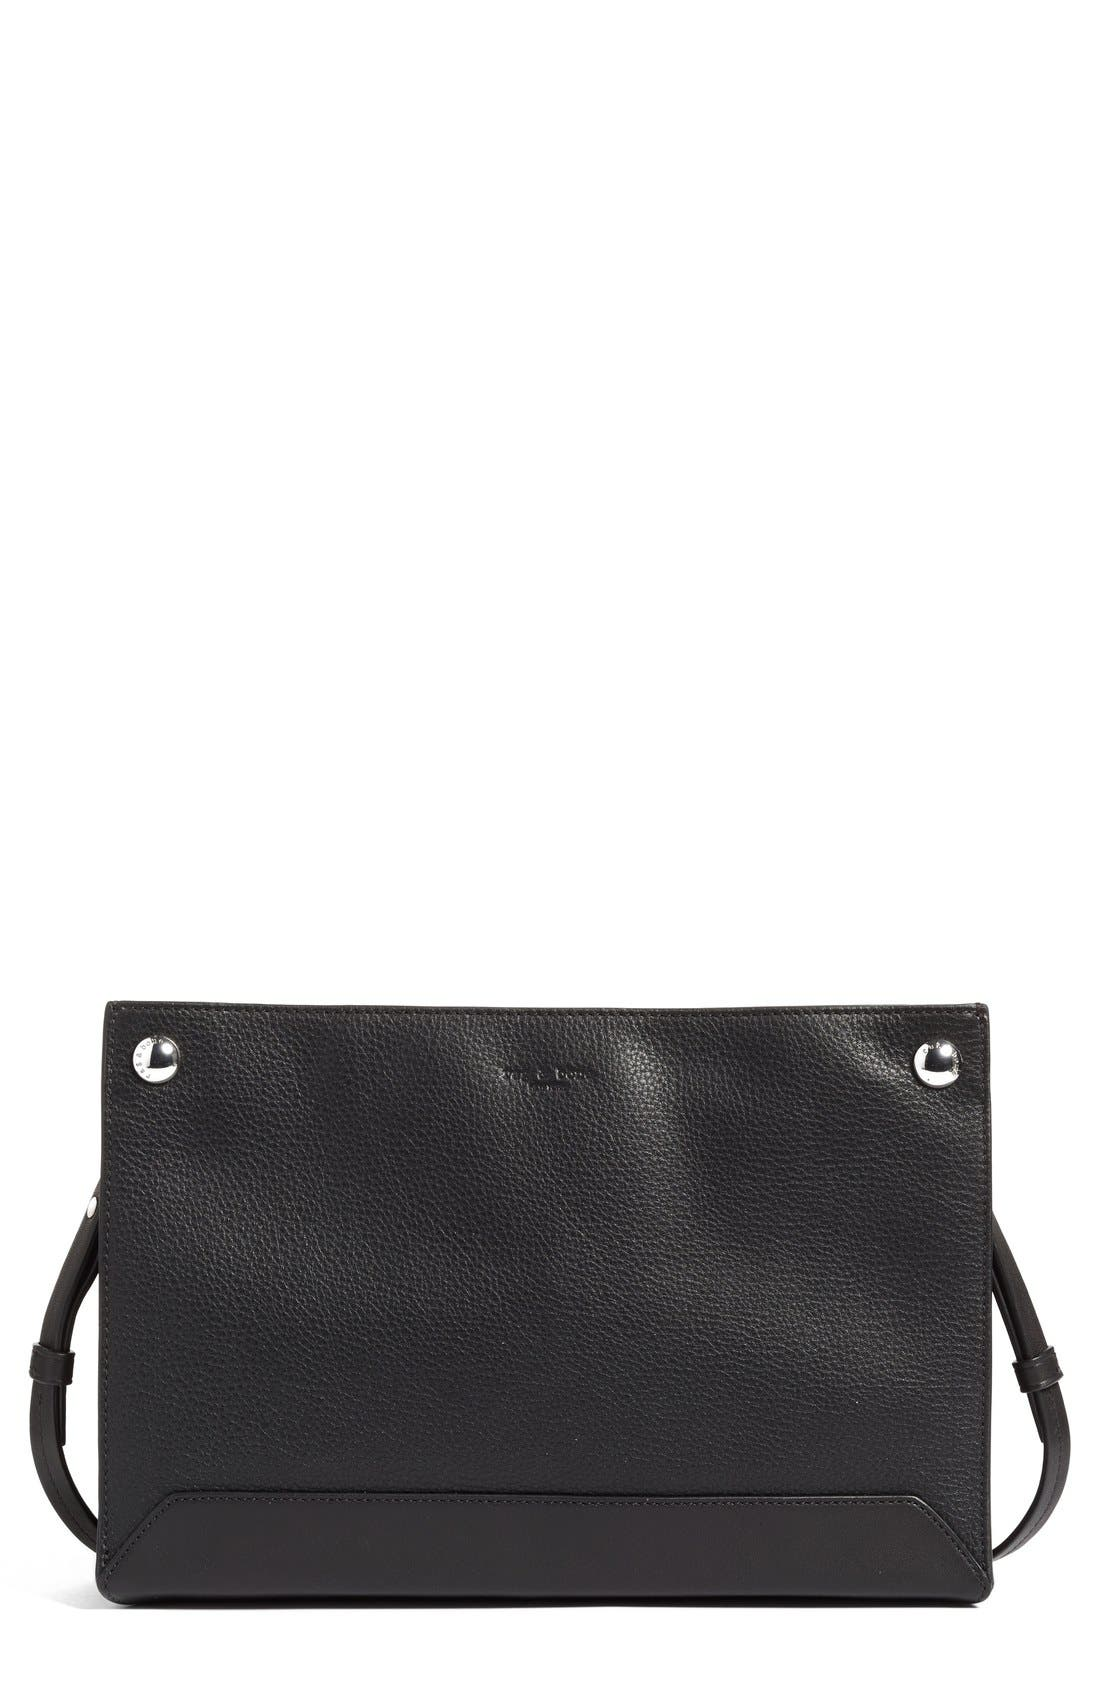 Main Image - rag & bone Compass Leather Crossbody Bag